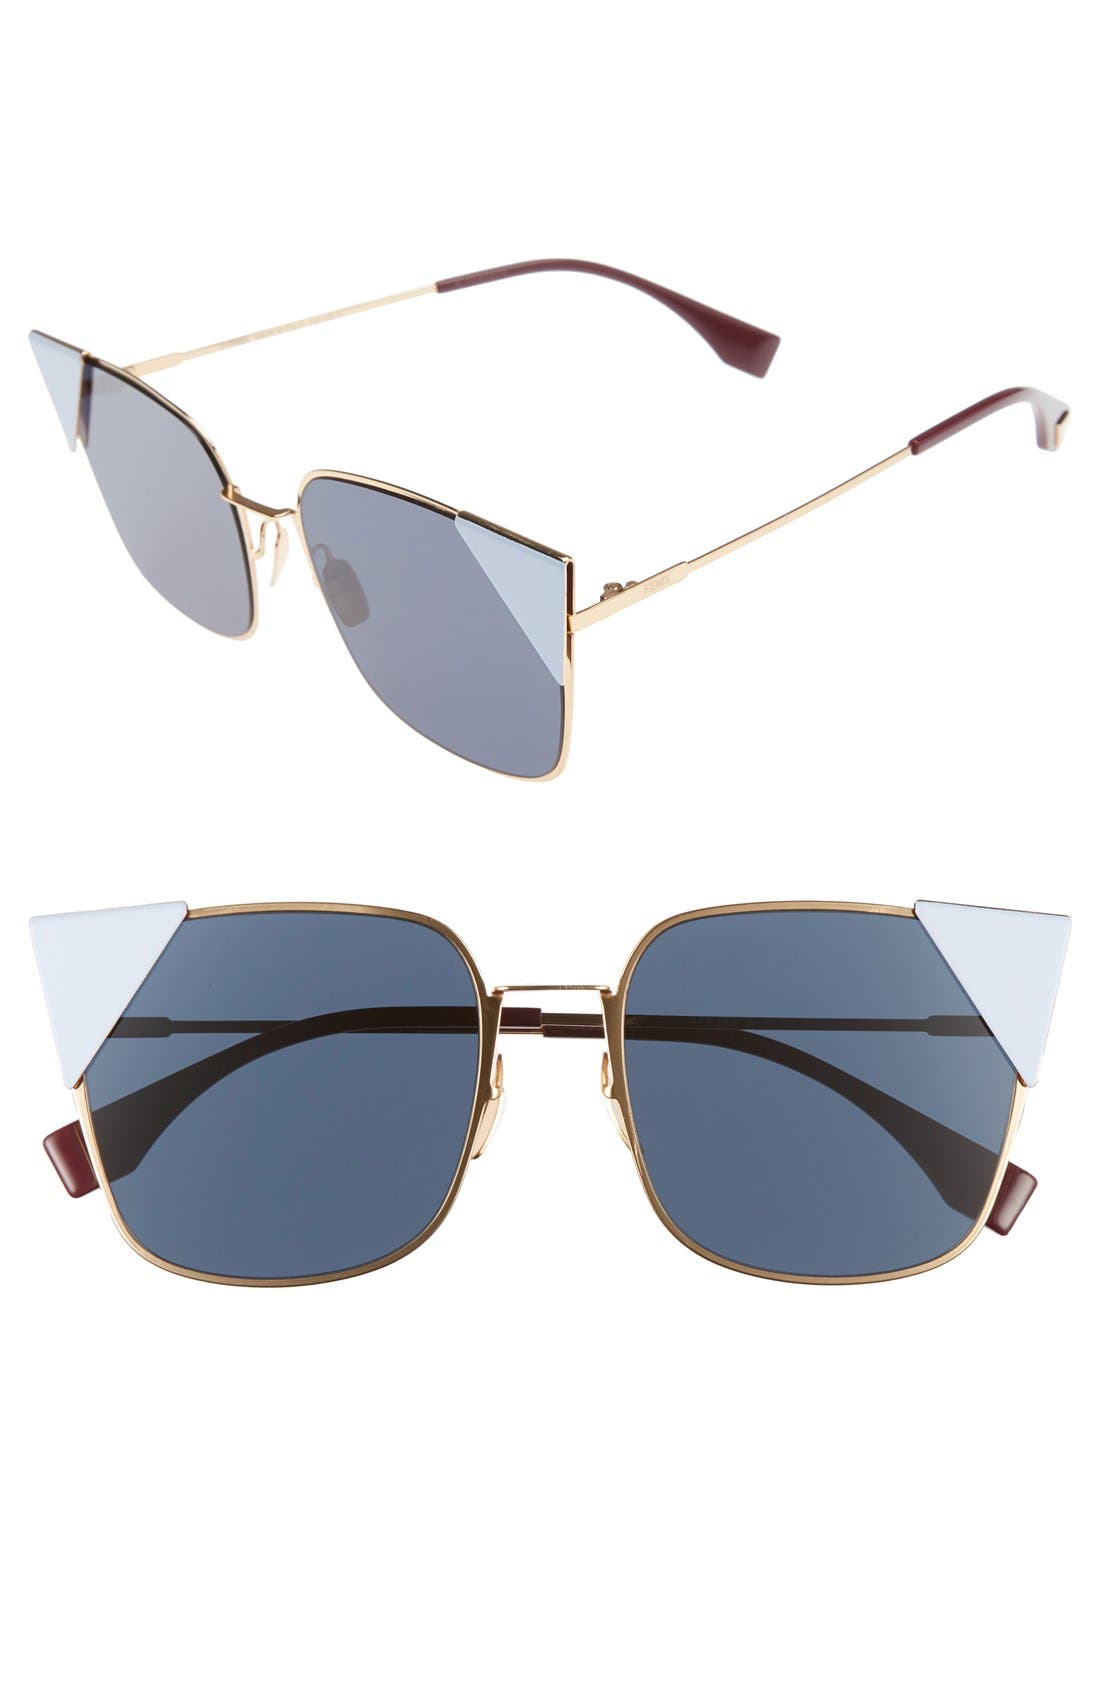 55mm Tipped Cat Eye Sunglasses,                             Main thumbnail 1, color,                             ROSE METALLIC GOLD